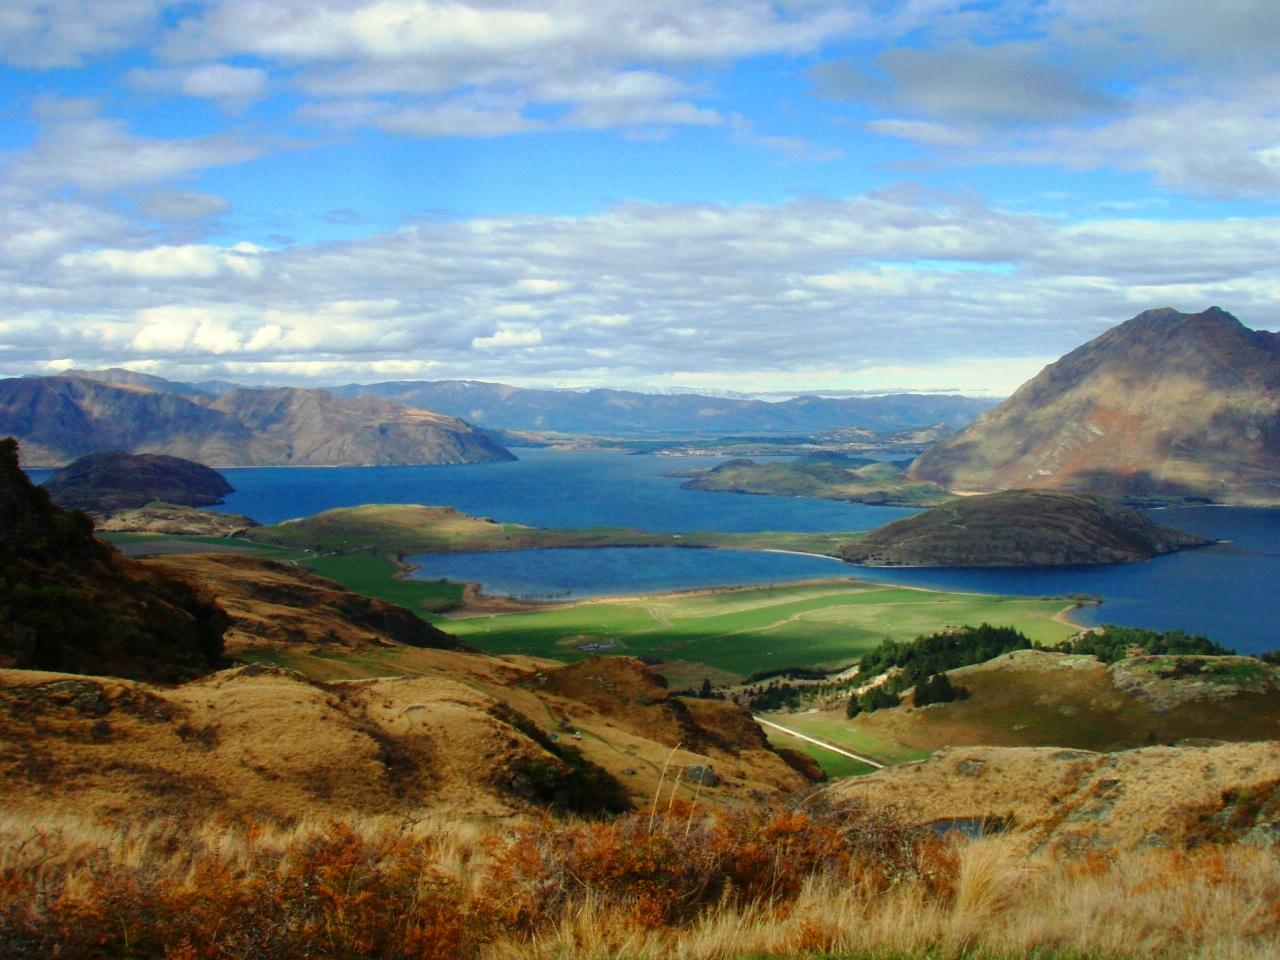 Nieuw Zeeland reis – Kiwi adventure.4